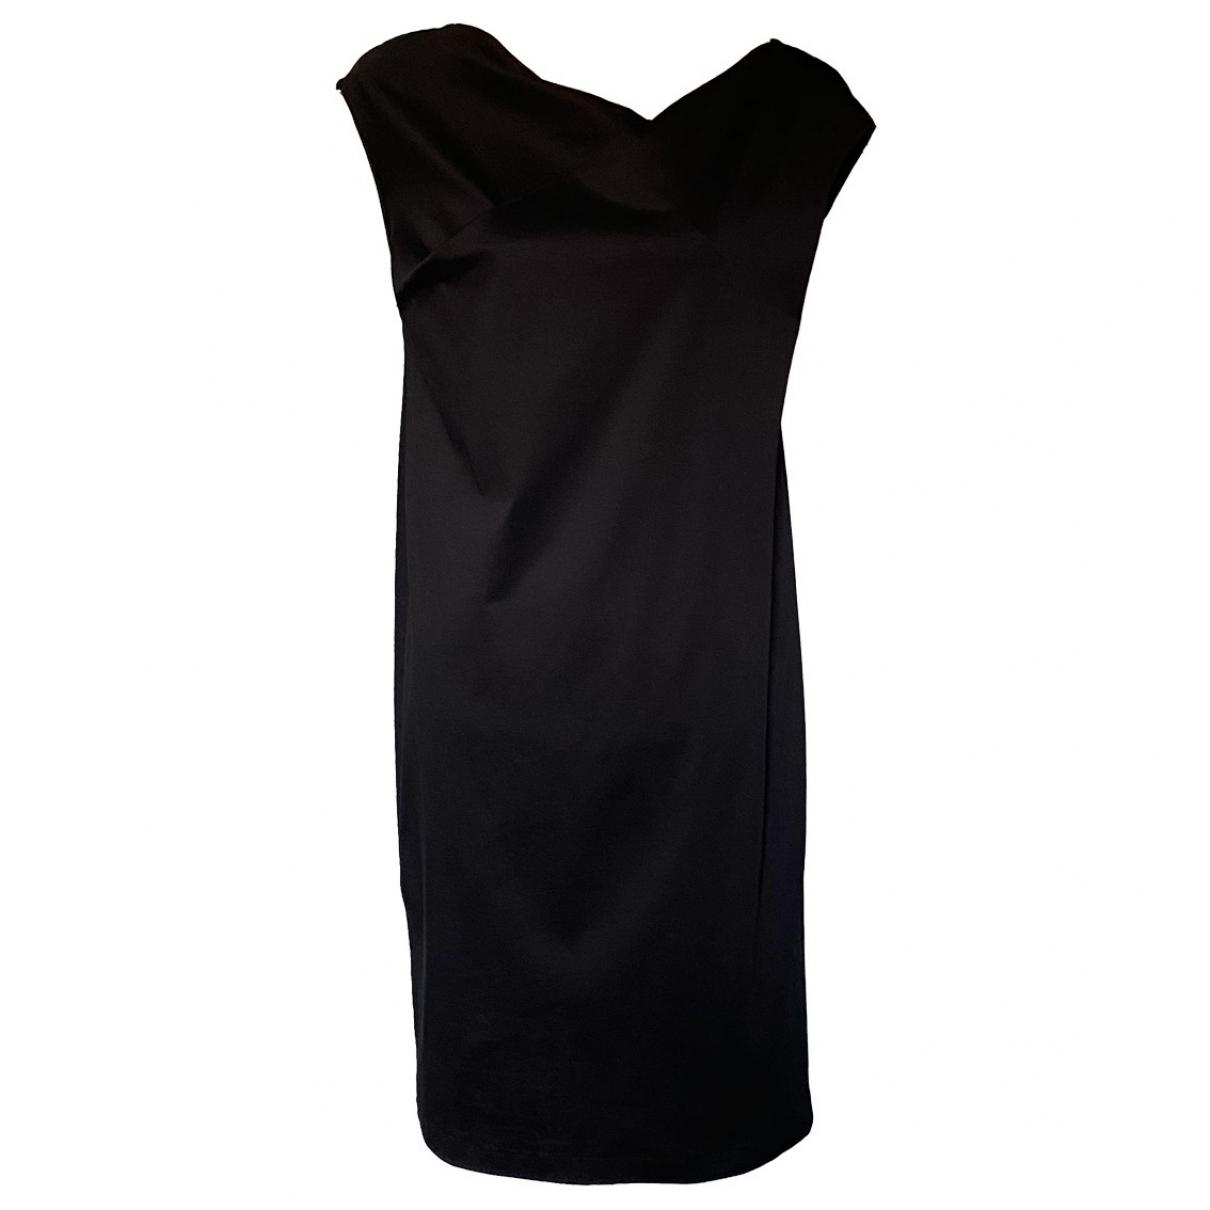 Jil Sander \N Black Cotton dress for Women 42 IT